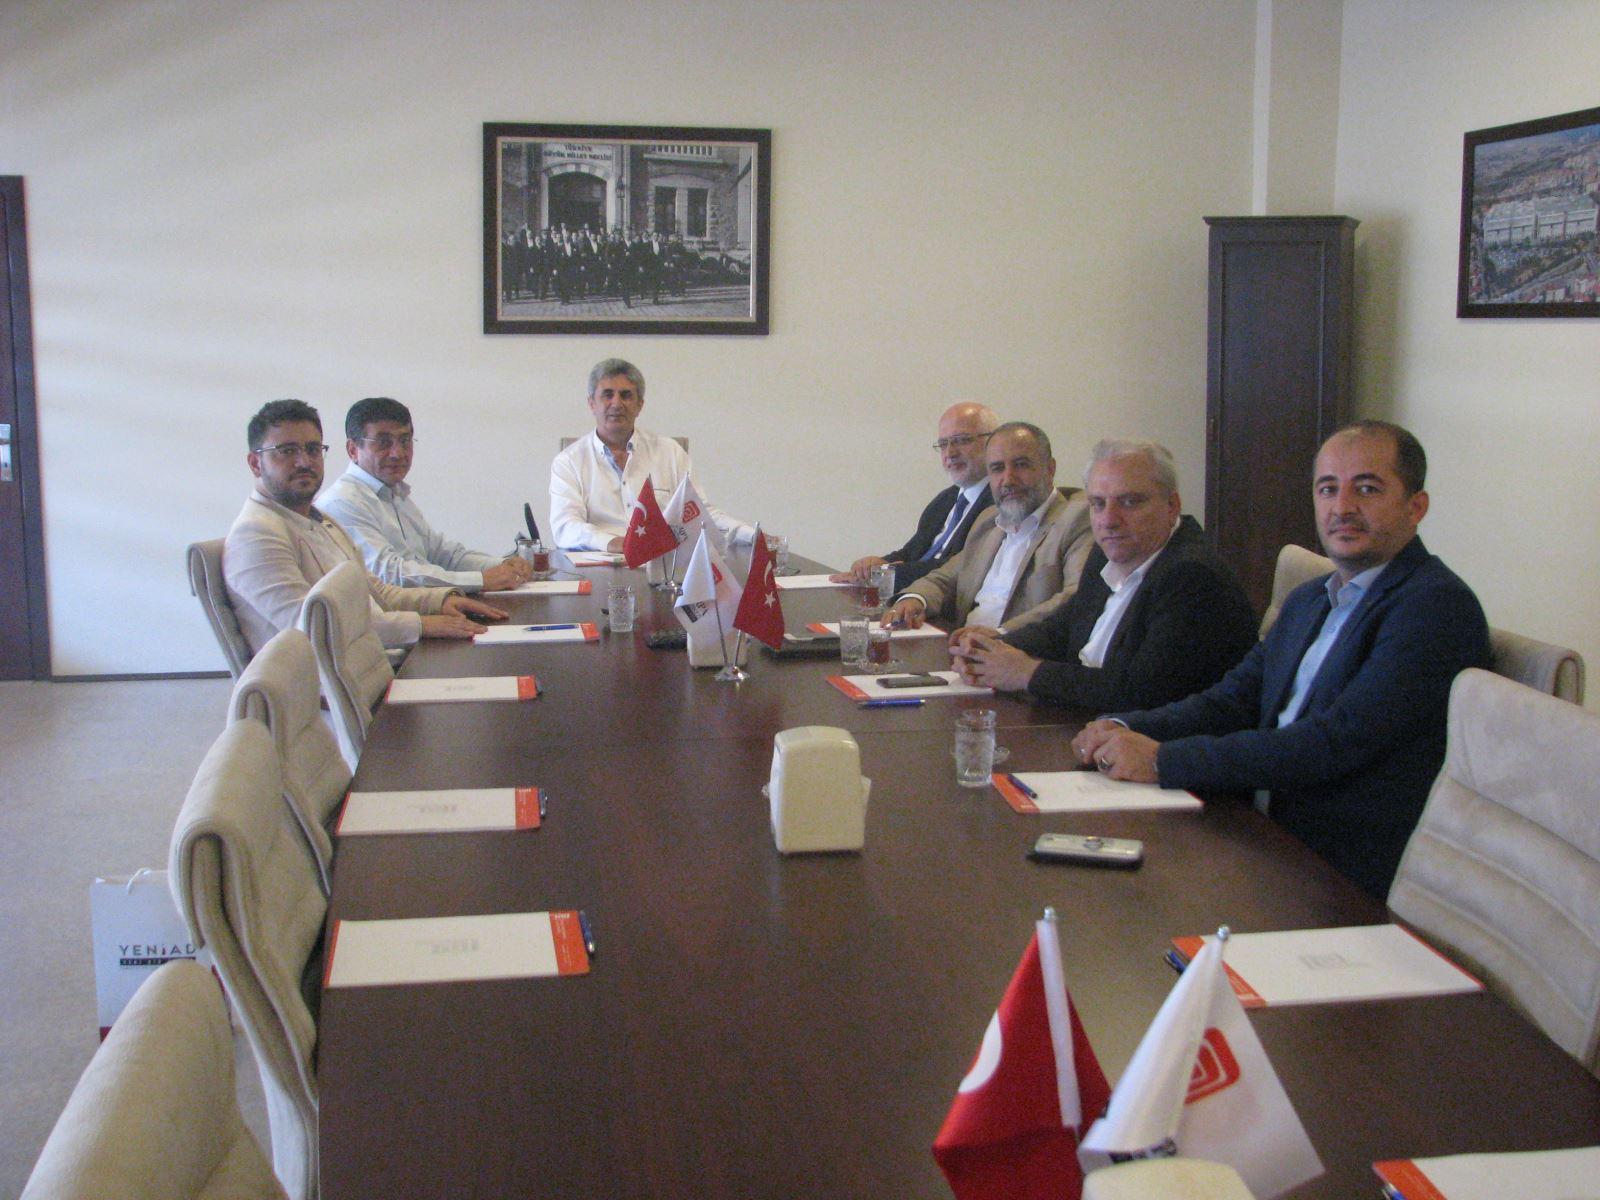 Yeniad Hasan Sezgin Ziyareti